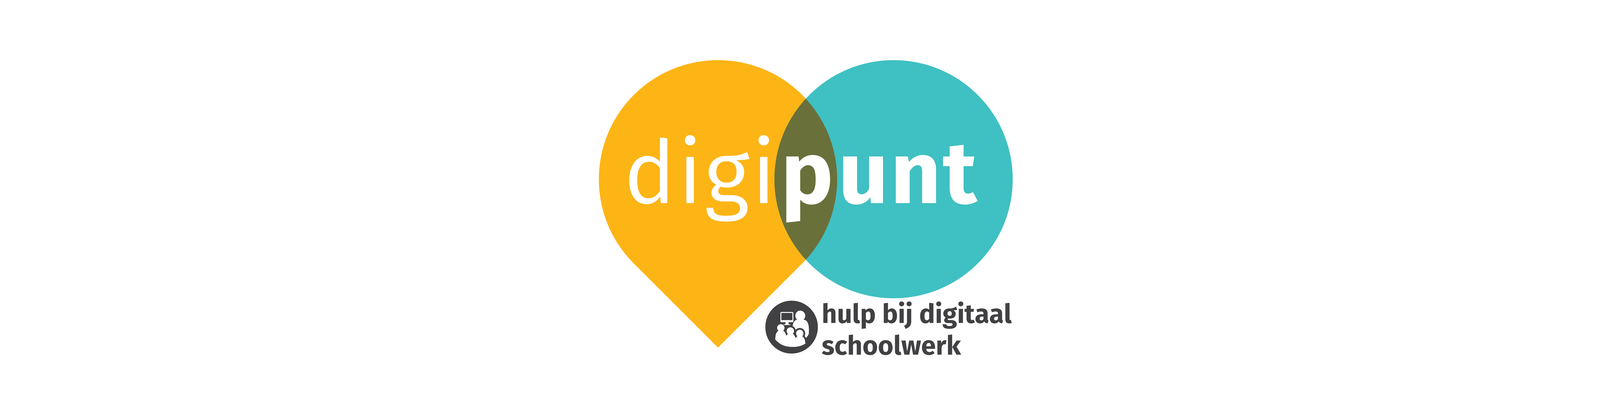 Digipunt hulp bij digitaal schoolwerk